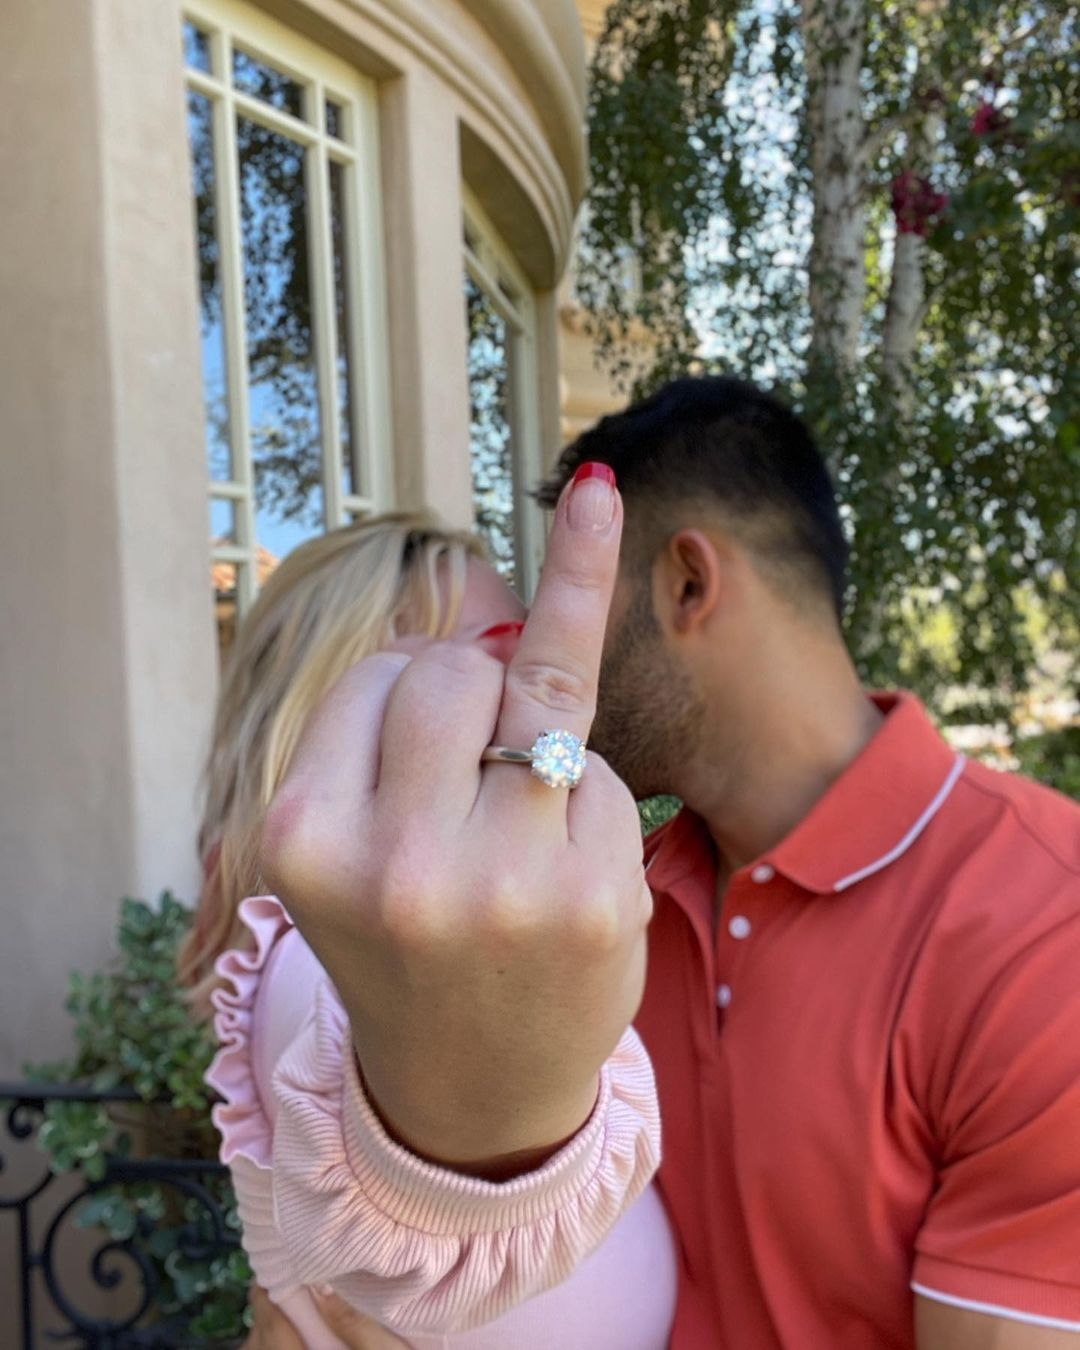 Сразу же после помолвки: Бритни Спирс удалила свою страницу в Instagram - фото №2